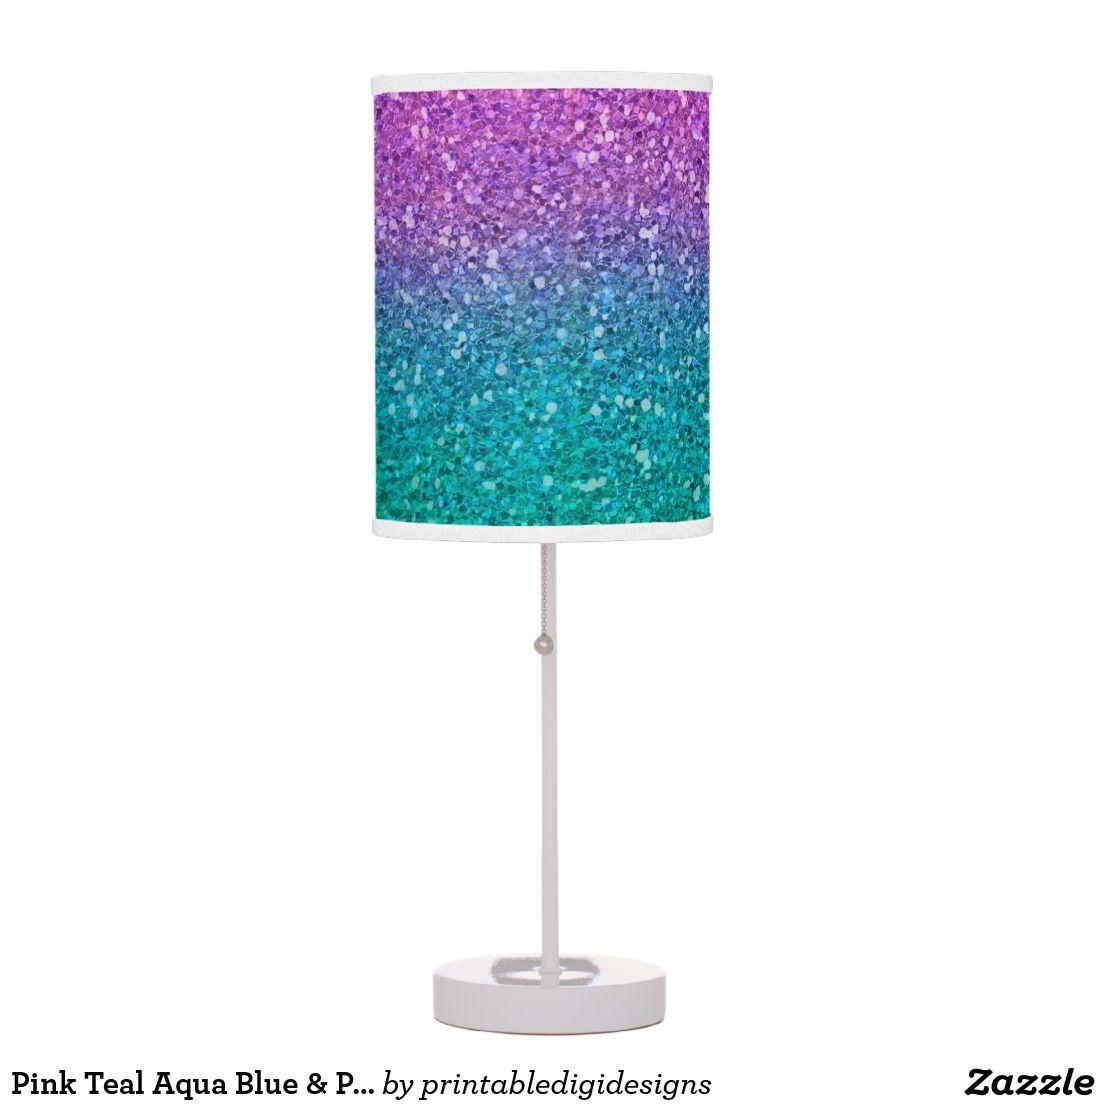 Pink Teal Aqua Blue & Purple Sparkly Glitter Table Lamp ...